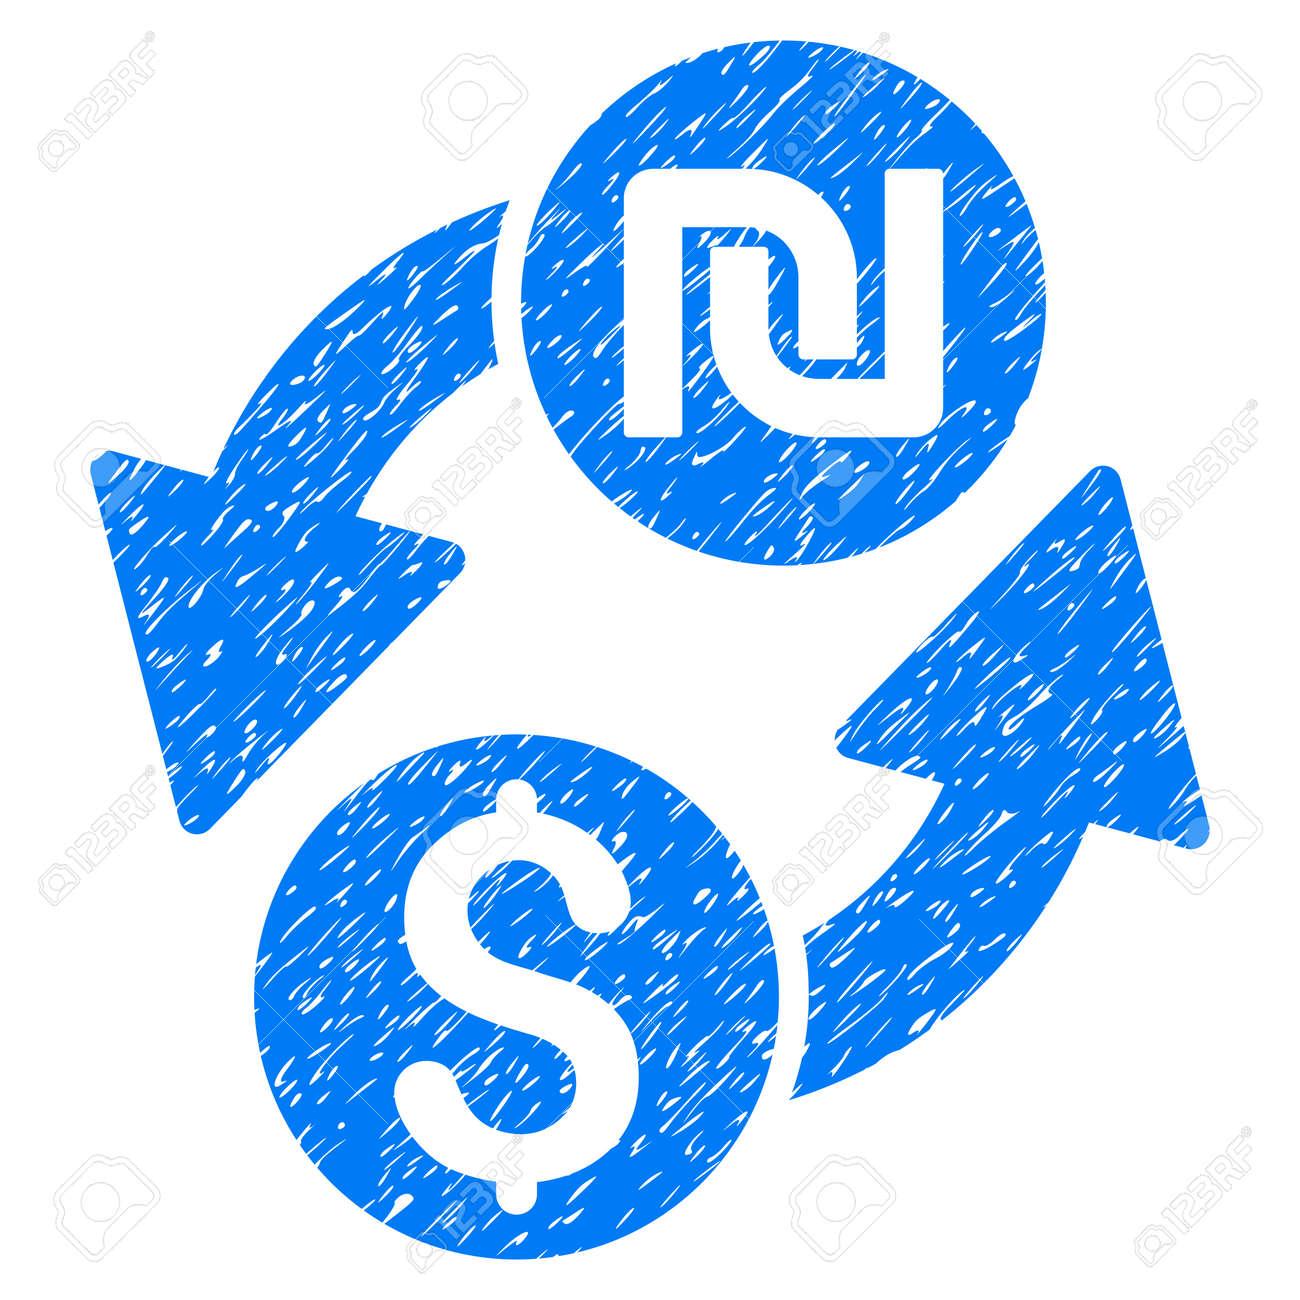 Dollar Shekel Exchange Grainy Textured Icon For Overlay Watermark